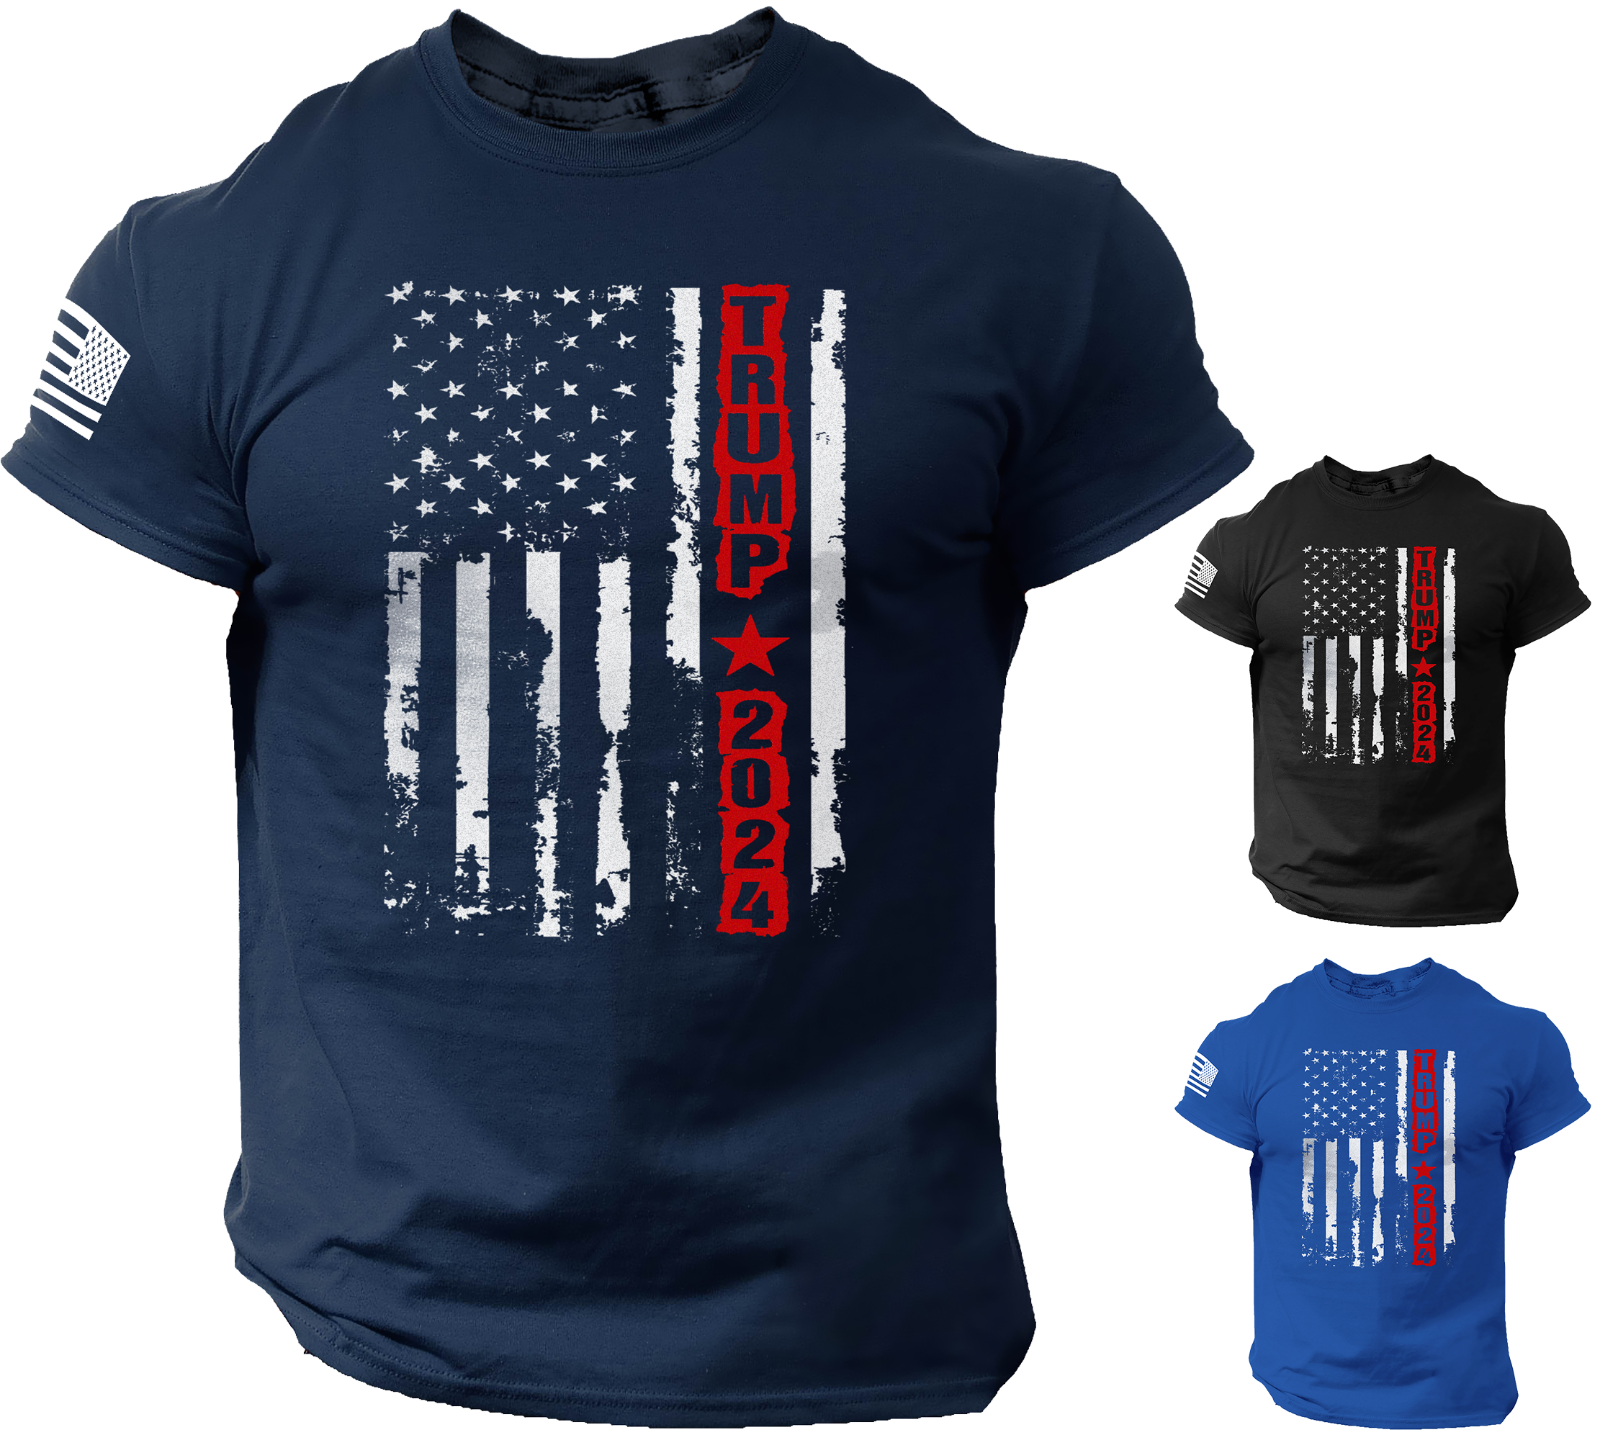 Trump 2024 T-shirt American Flag MAGA Shirts Clothing, Shoes & Accessories